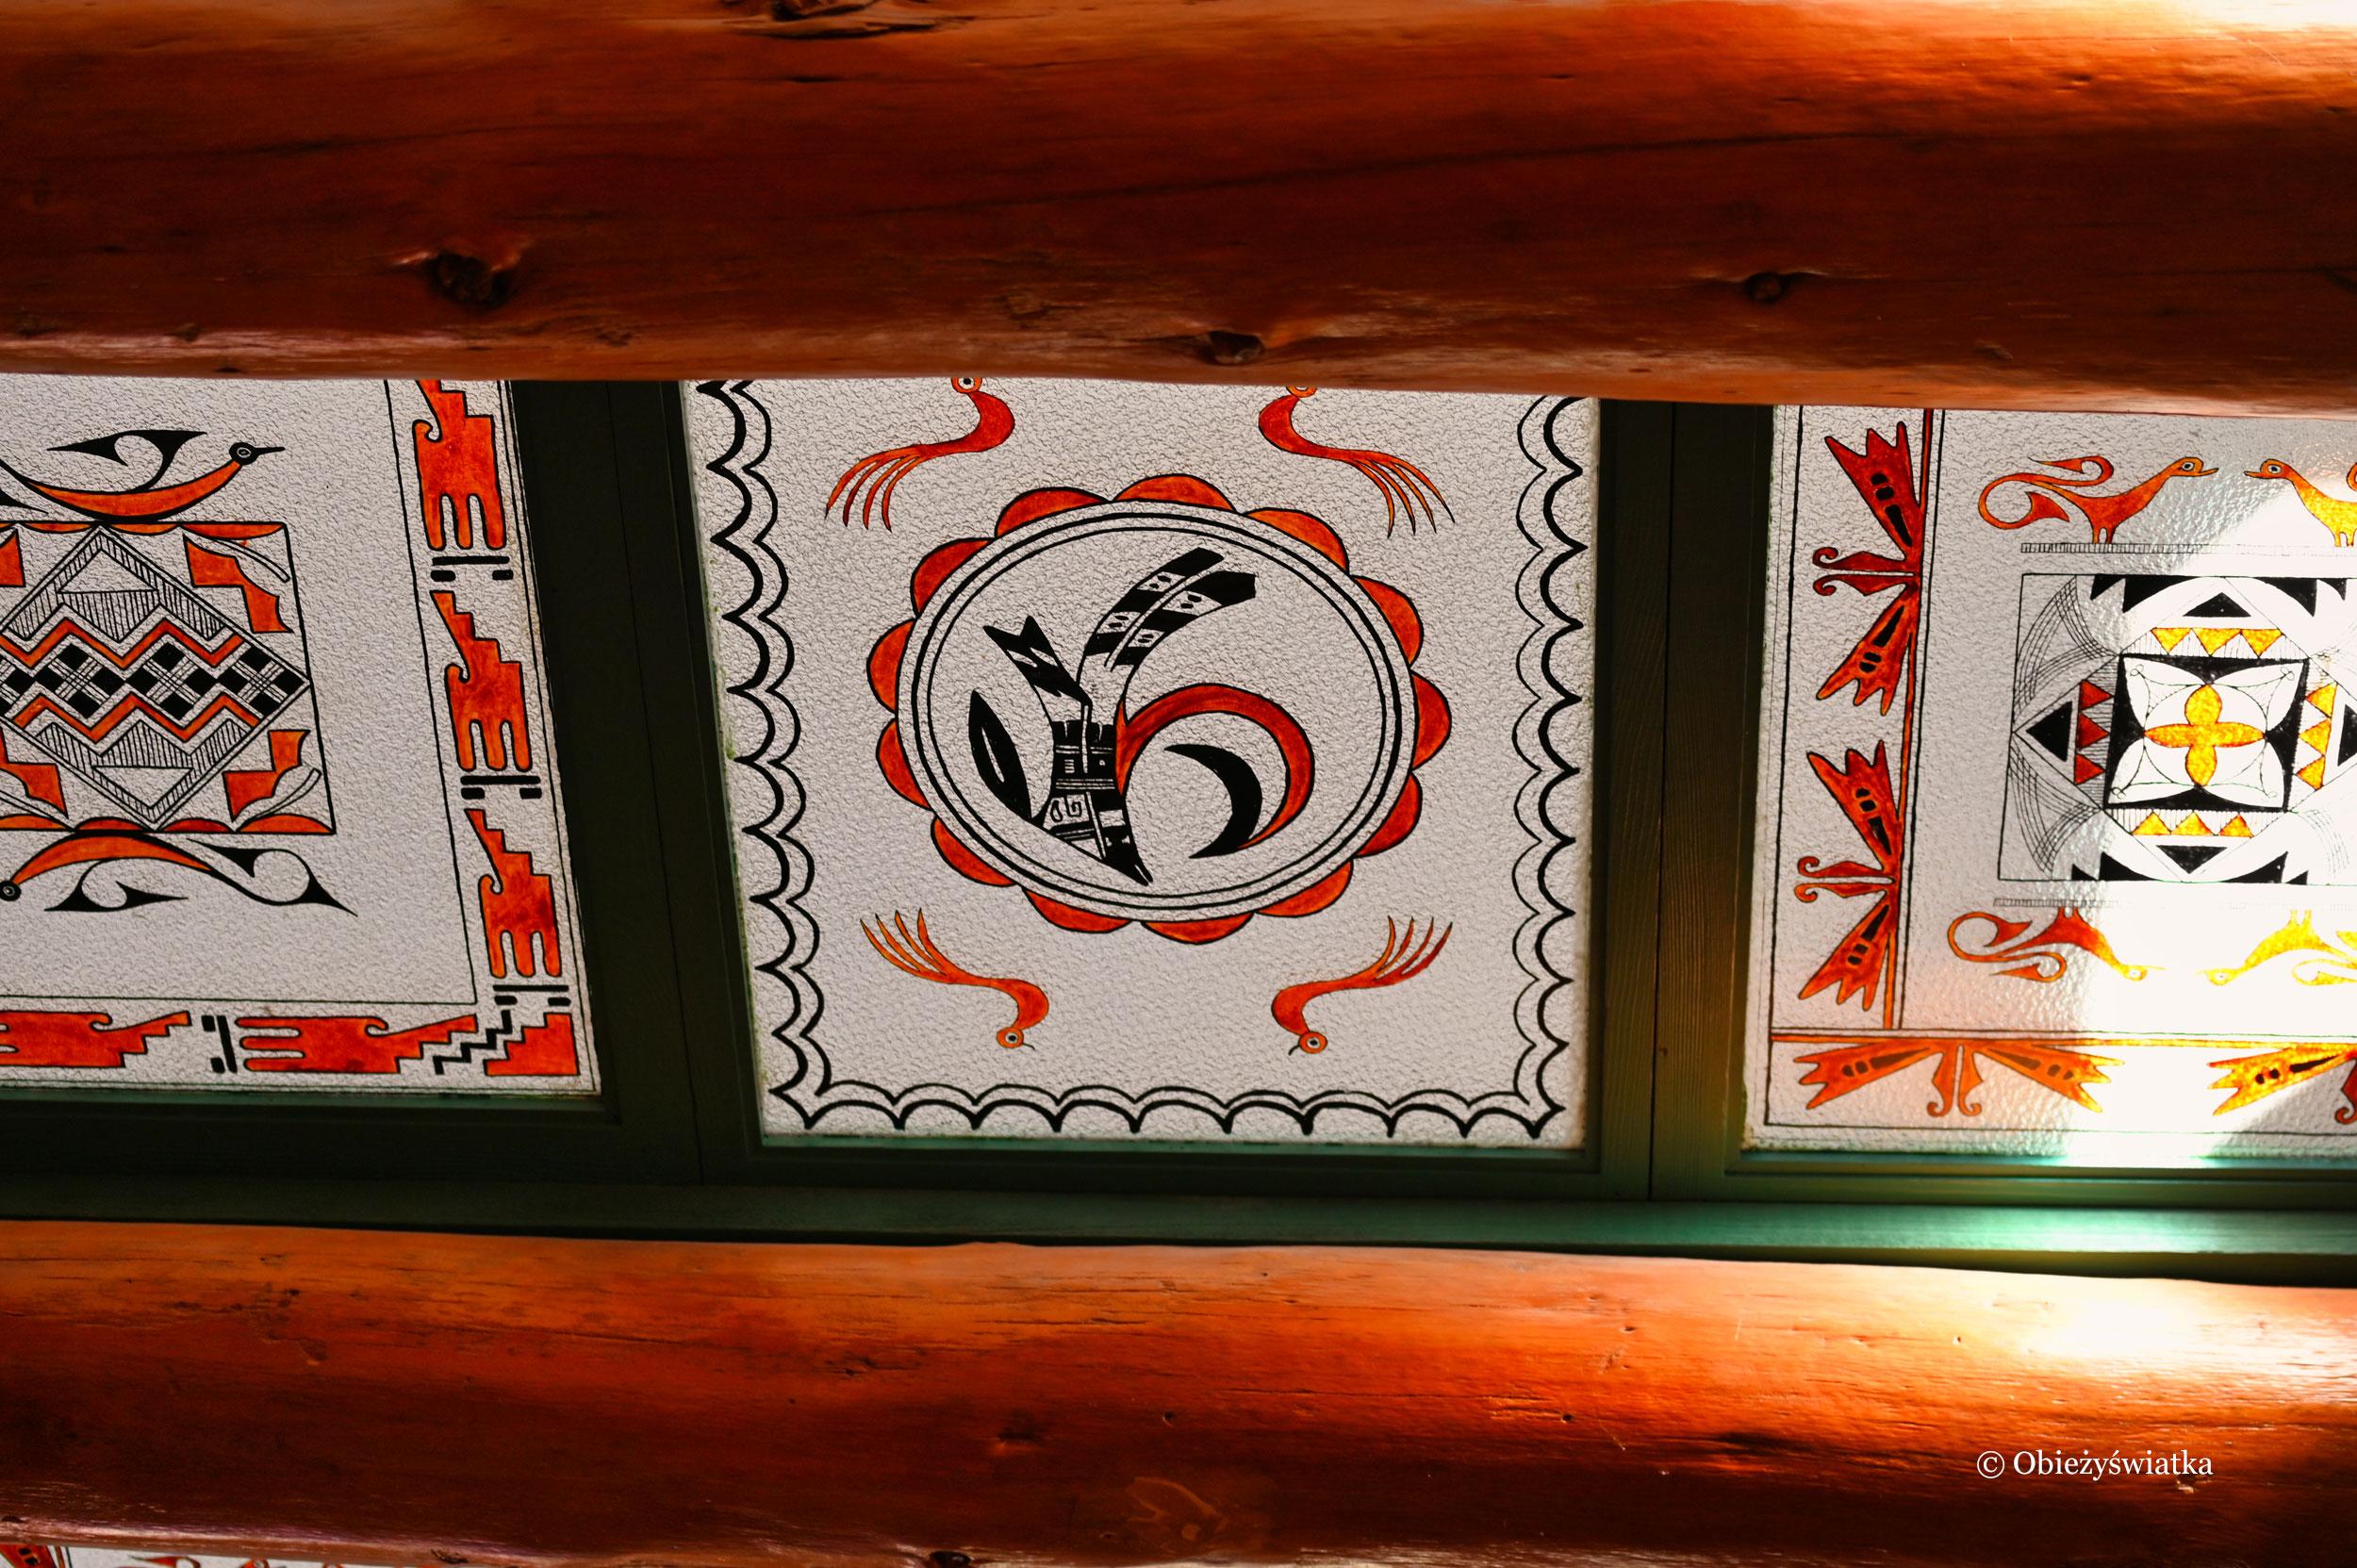 Witraże w dachu Painted Desert Inn, Arizona